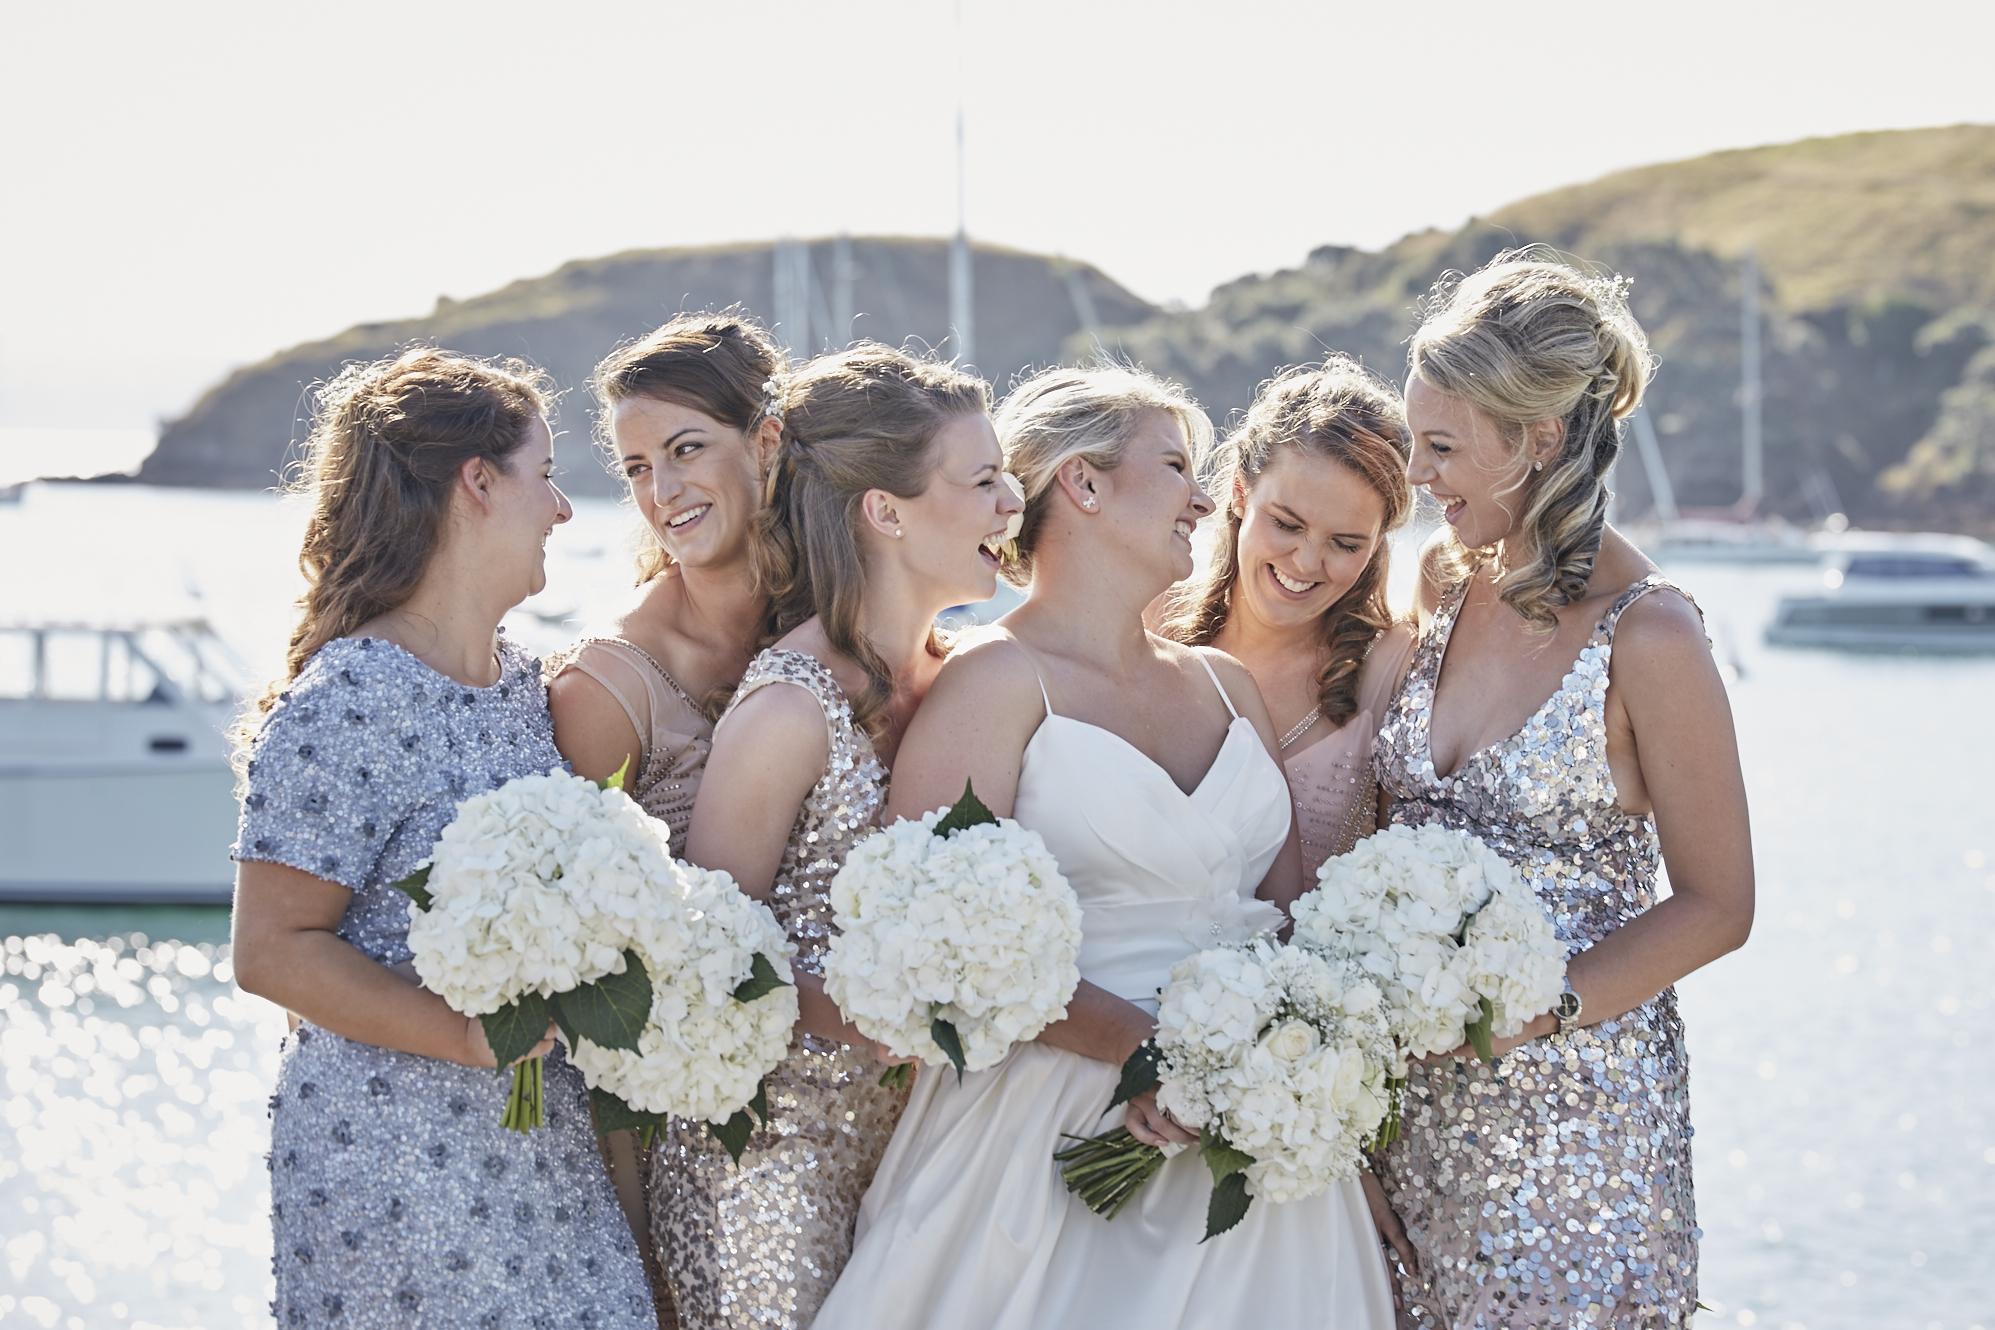 Bridesmaids around the bride